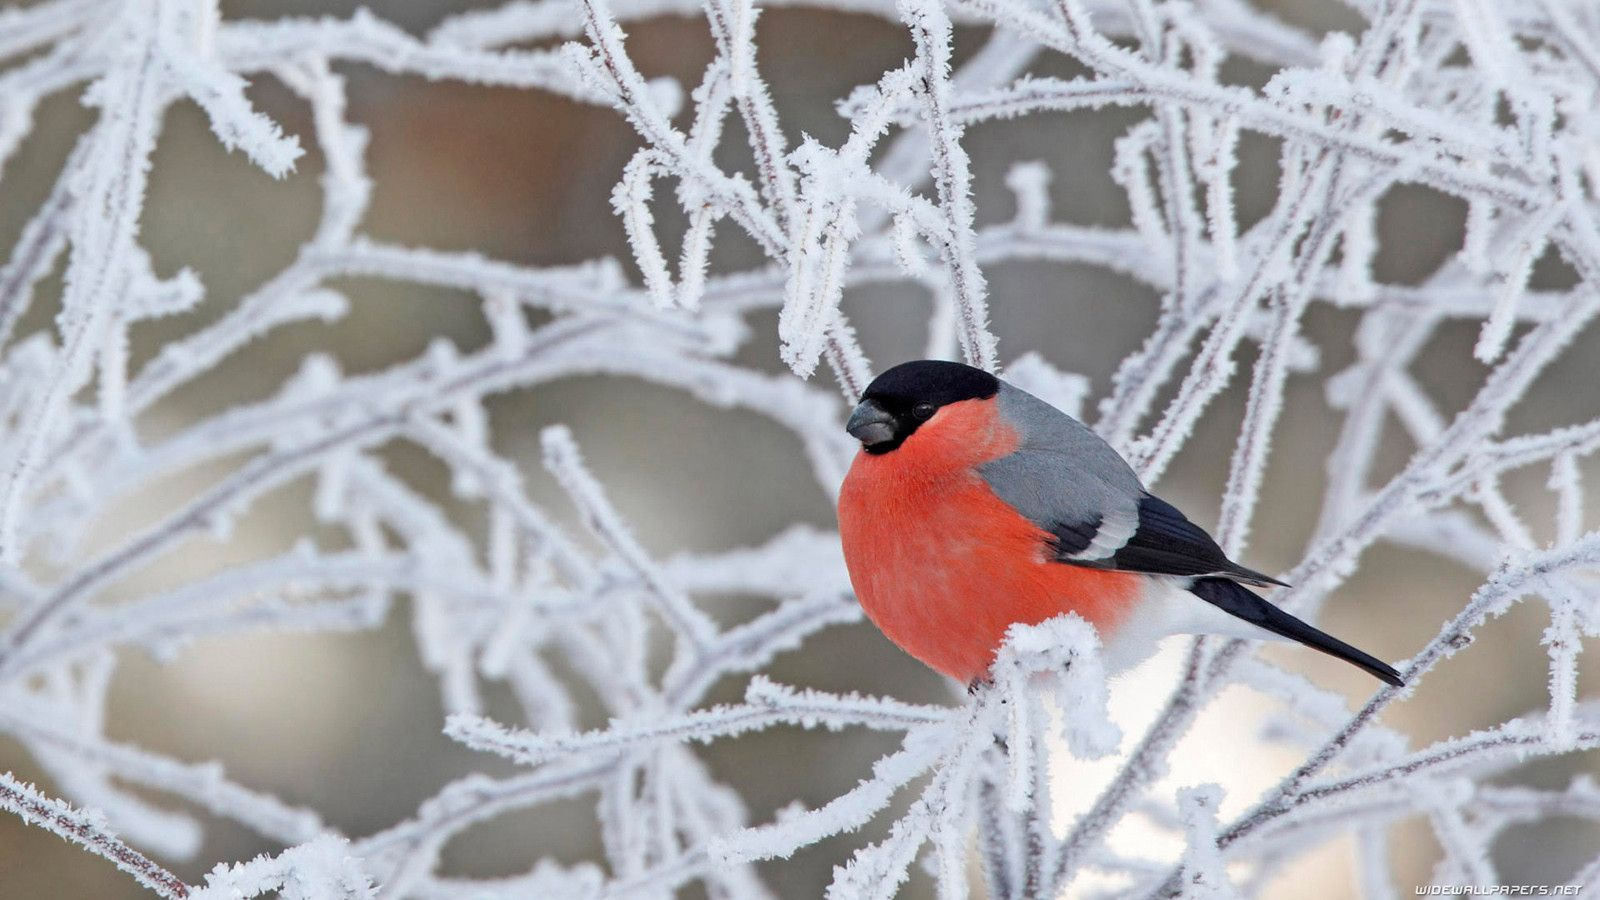 1600x900 خلفية الطيور [1600x900].  خلفية سطح المكتب.  طائر